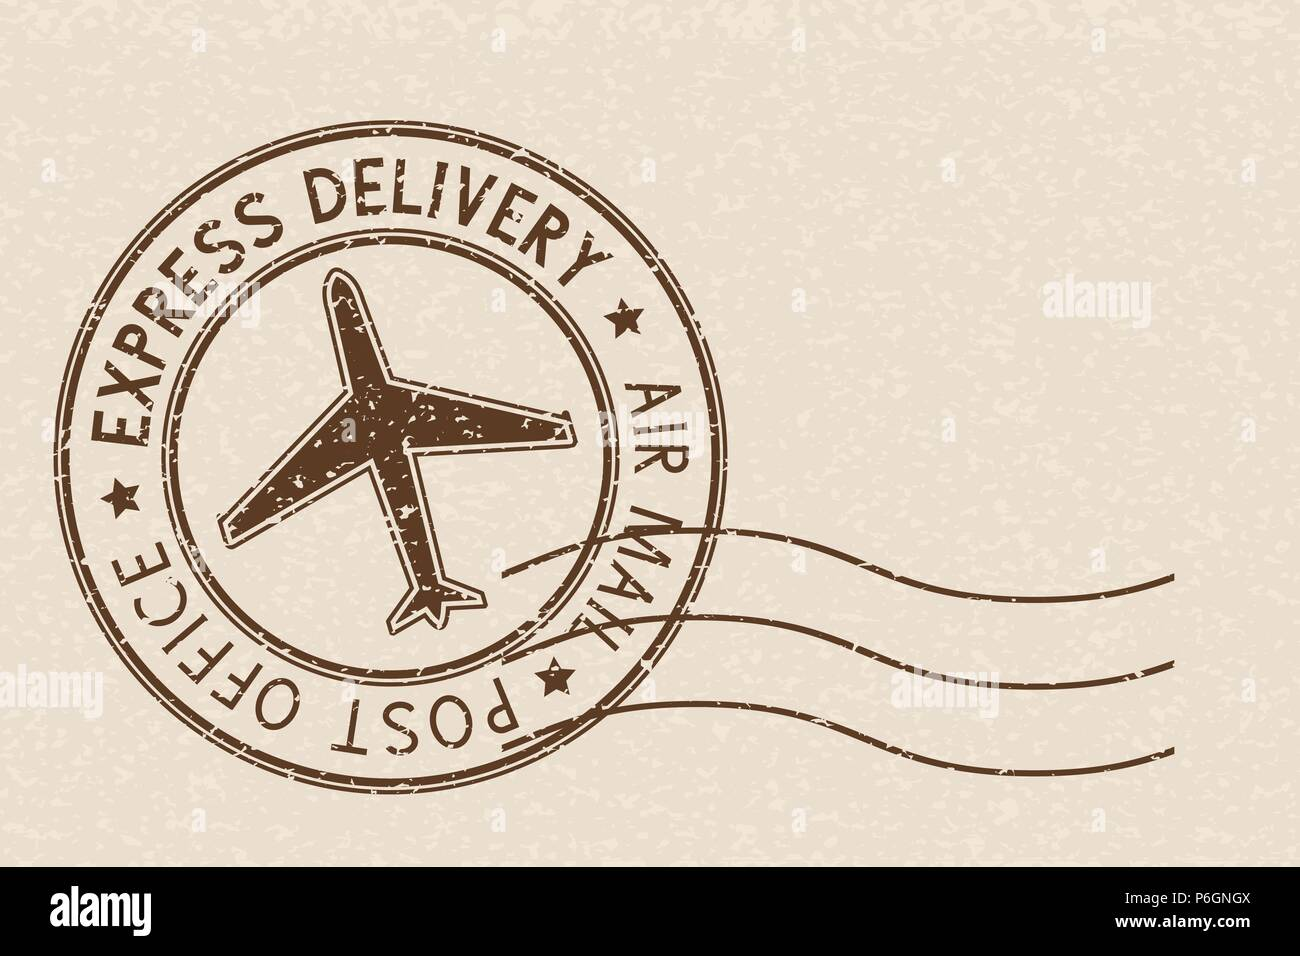 Round brown postmark on beige background - Stock Image